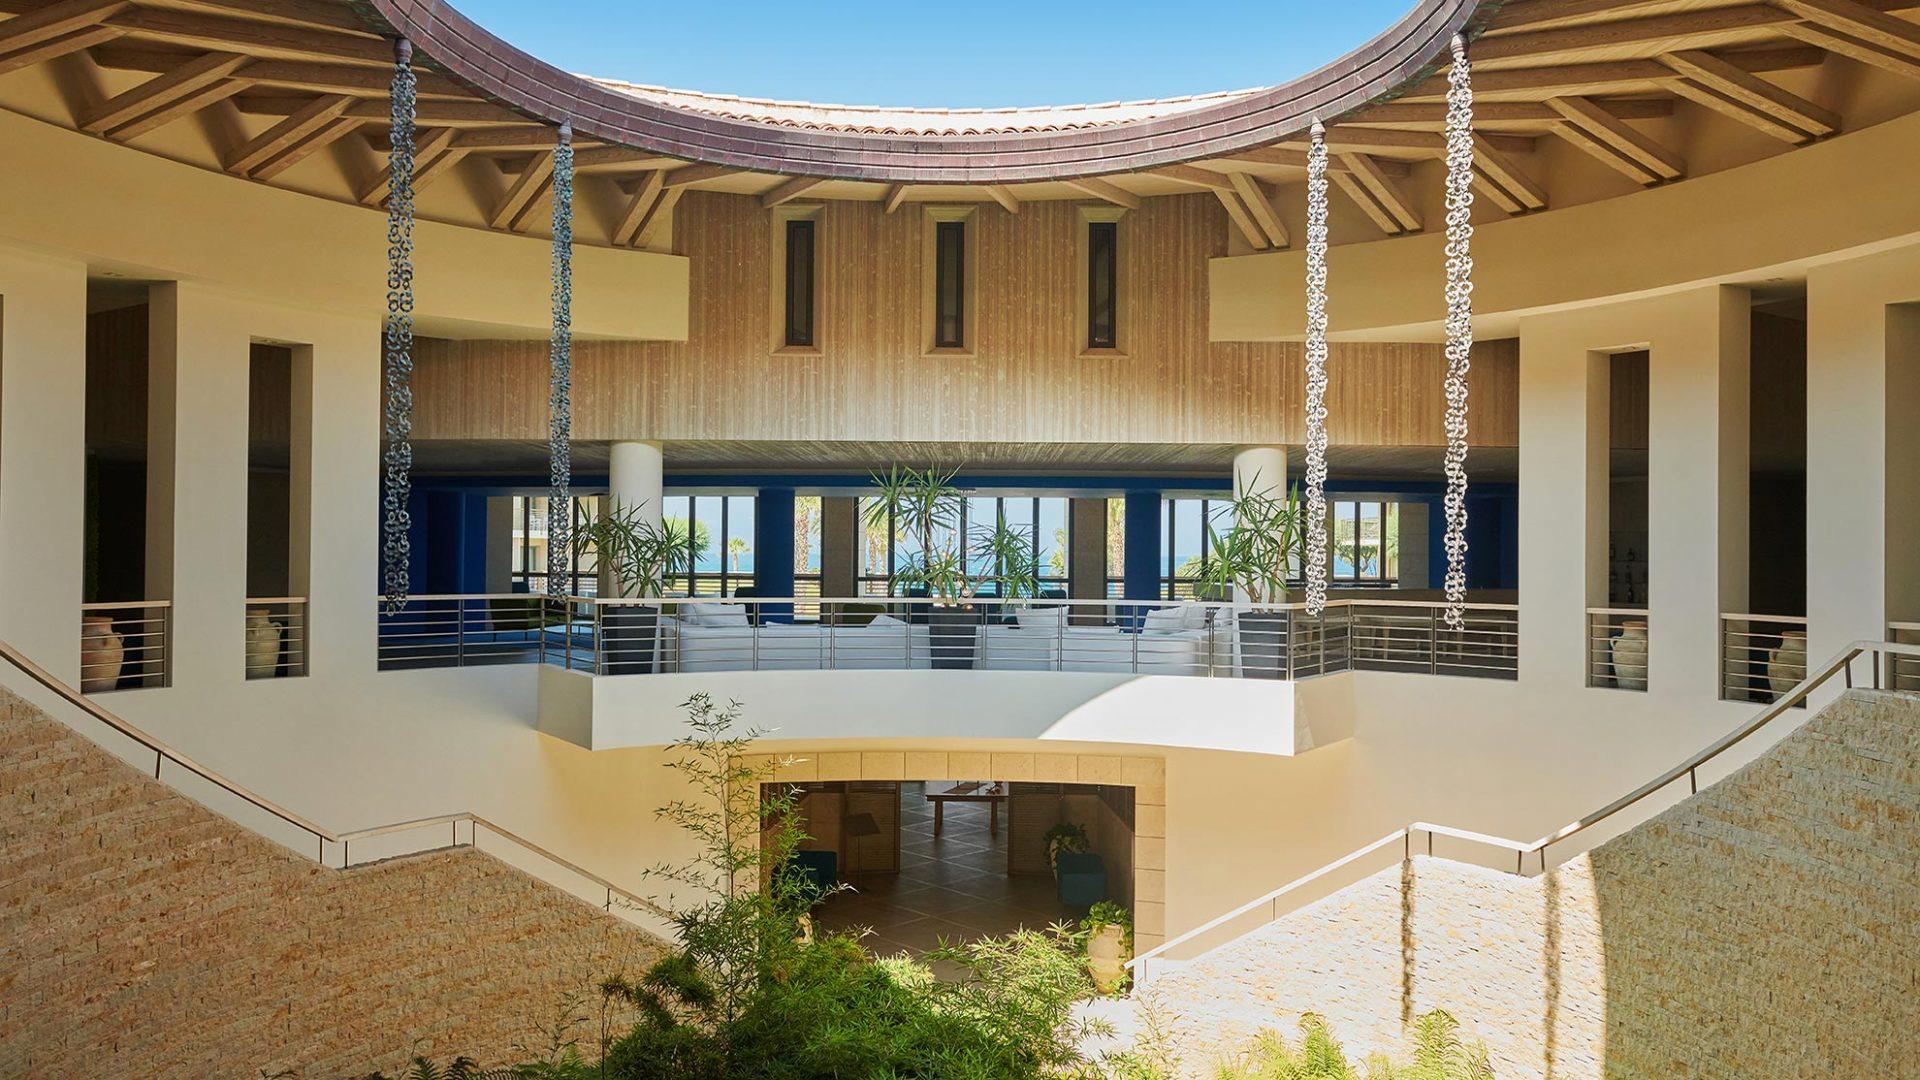 Restyling Capovaticano Resort